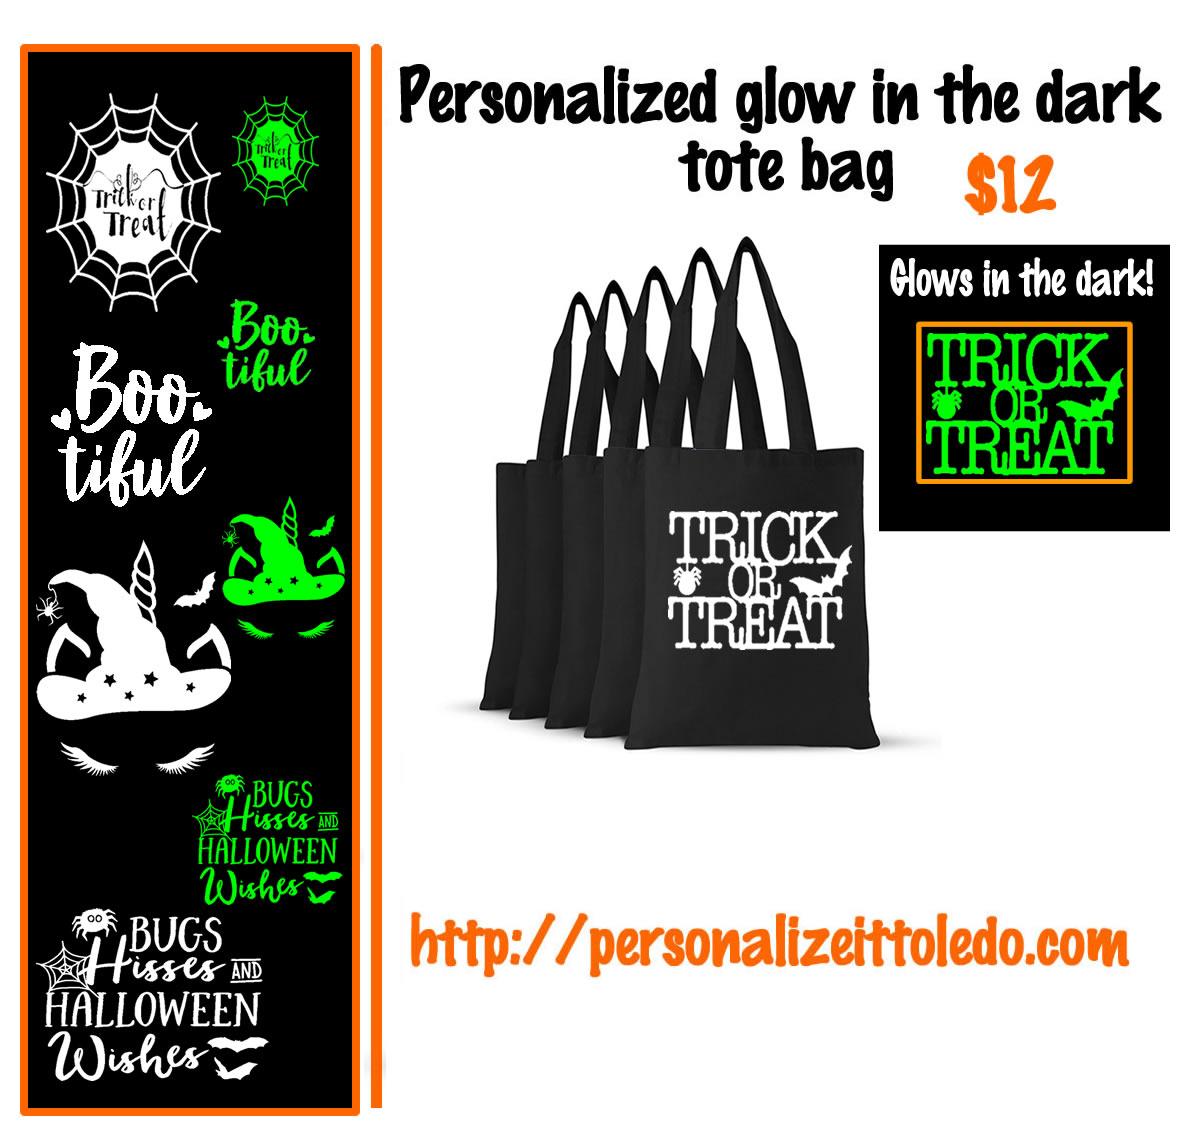 glow-in-the-dark halloween tote bag